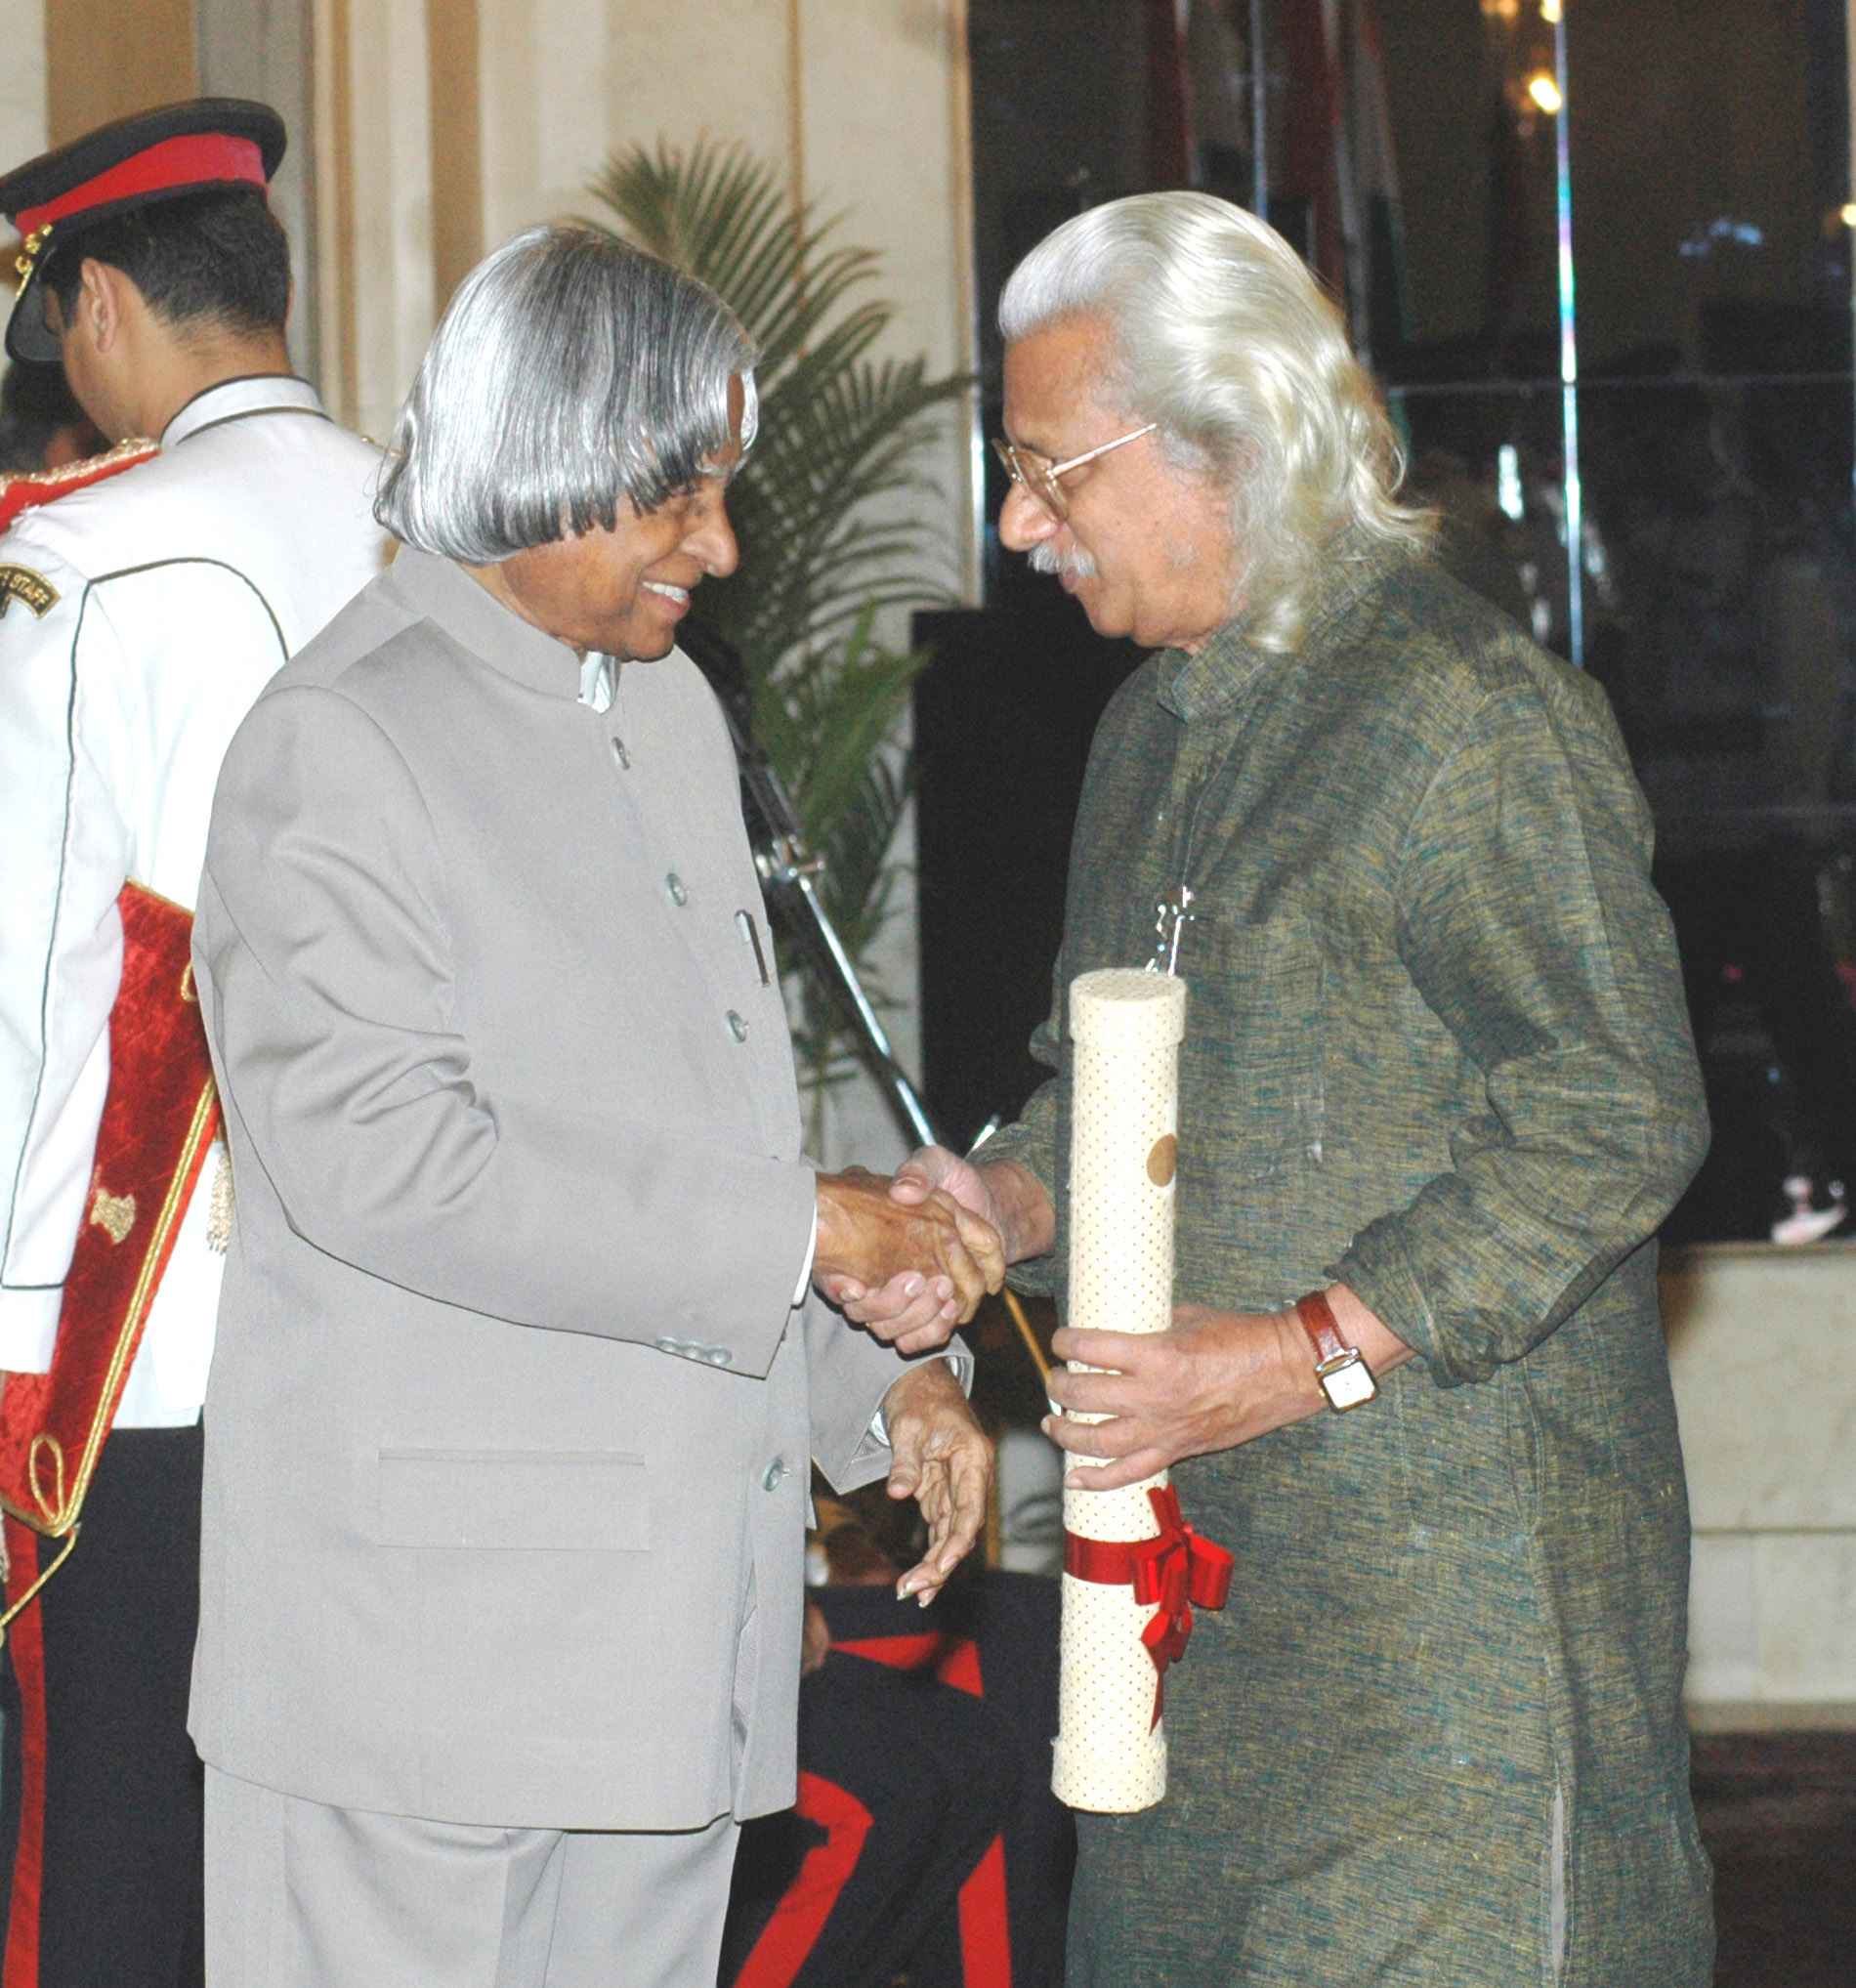 Adoor Gopalakrishnan - Wikipedia